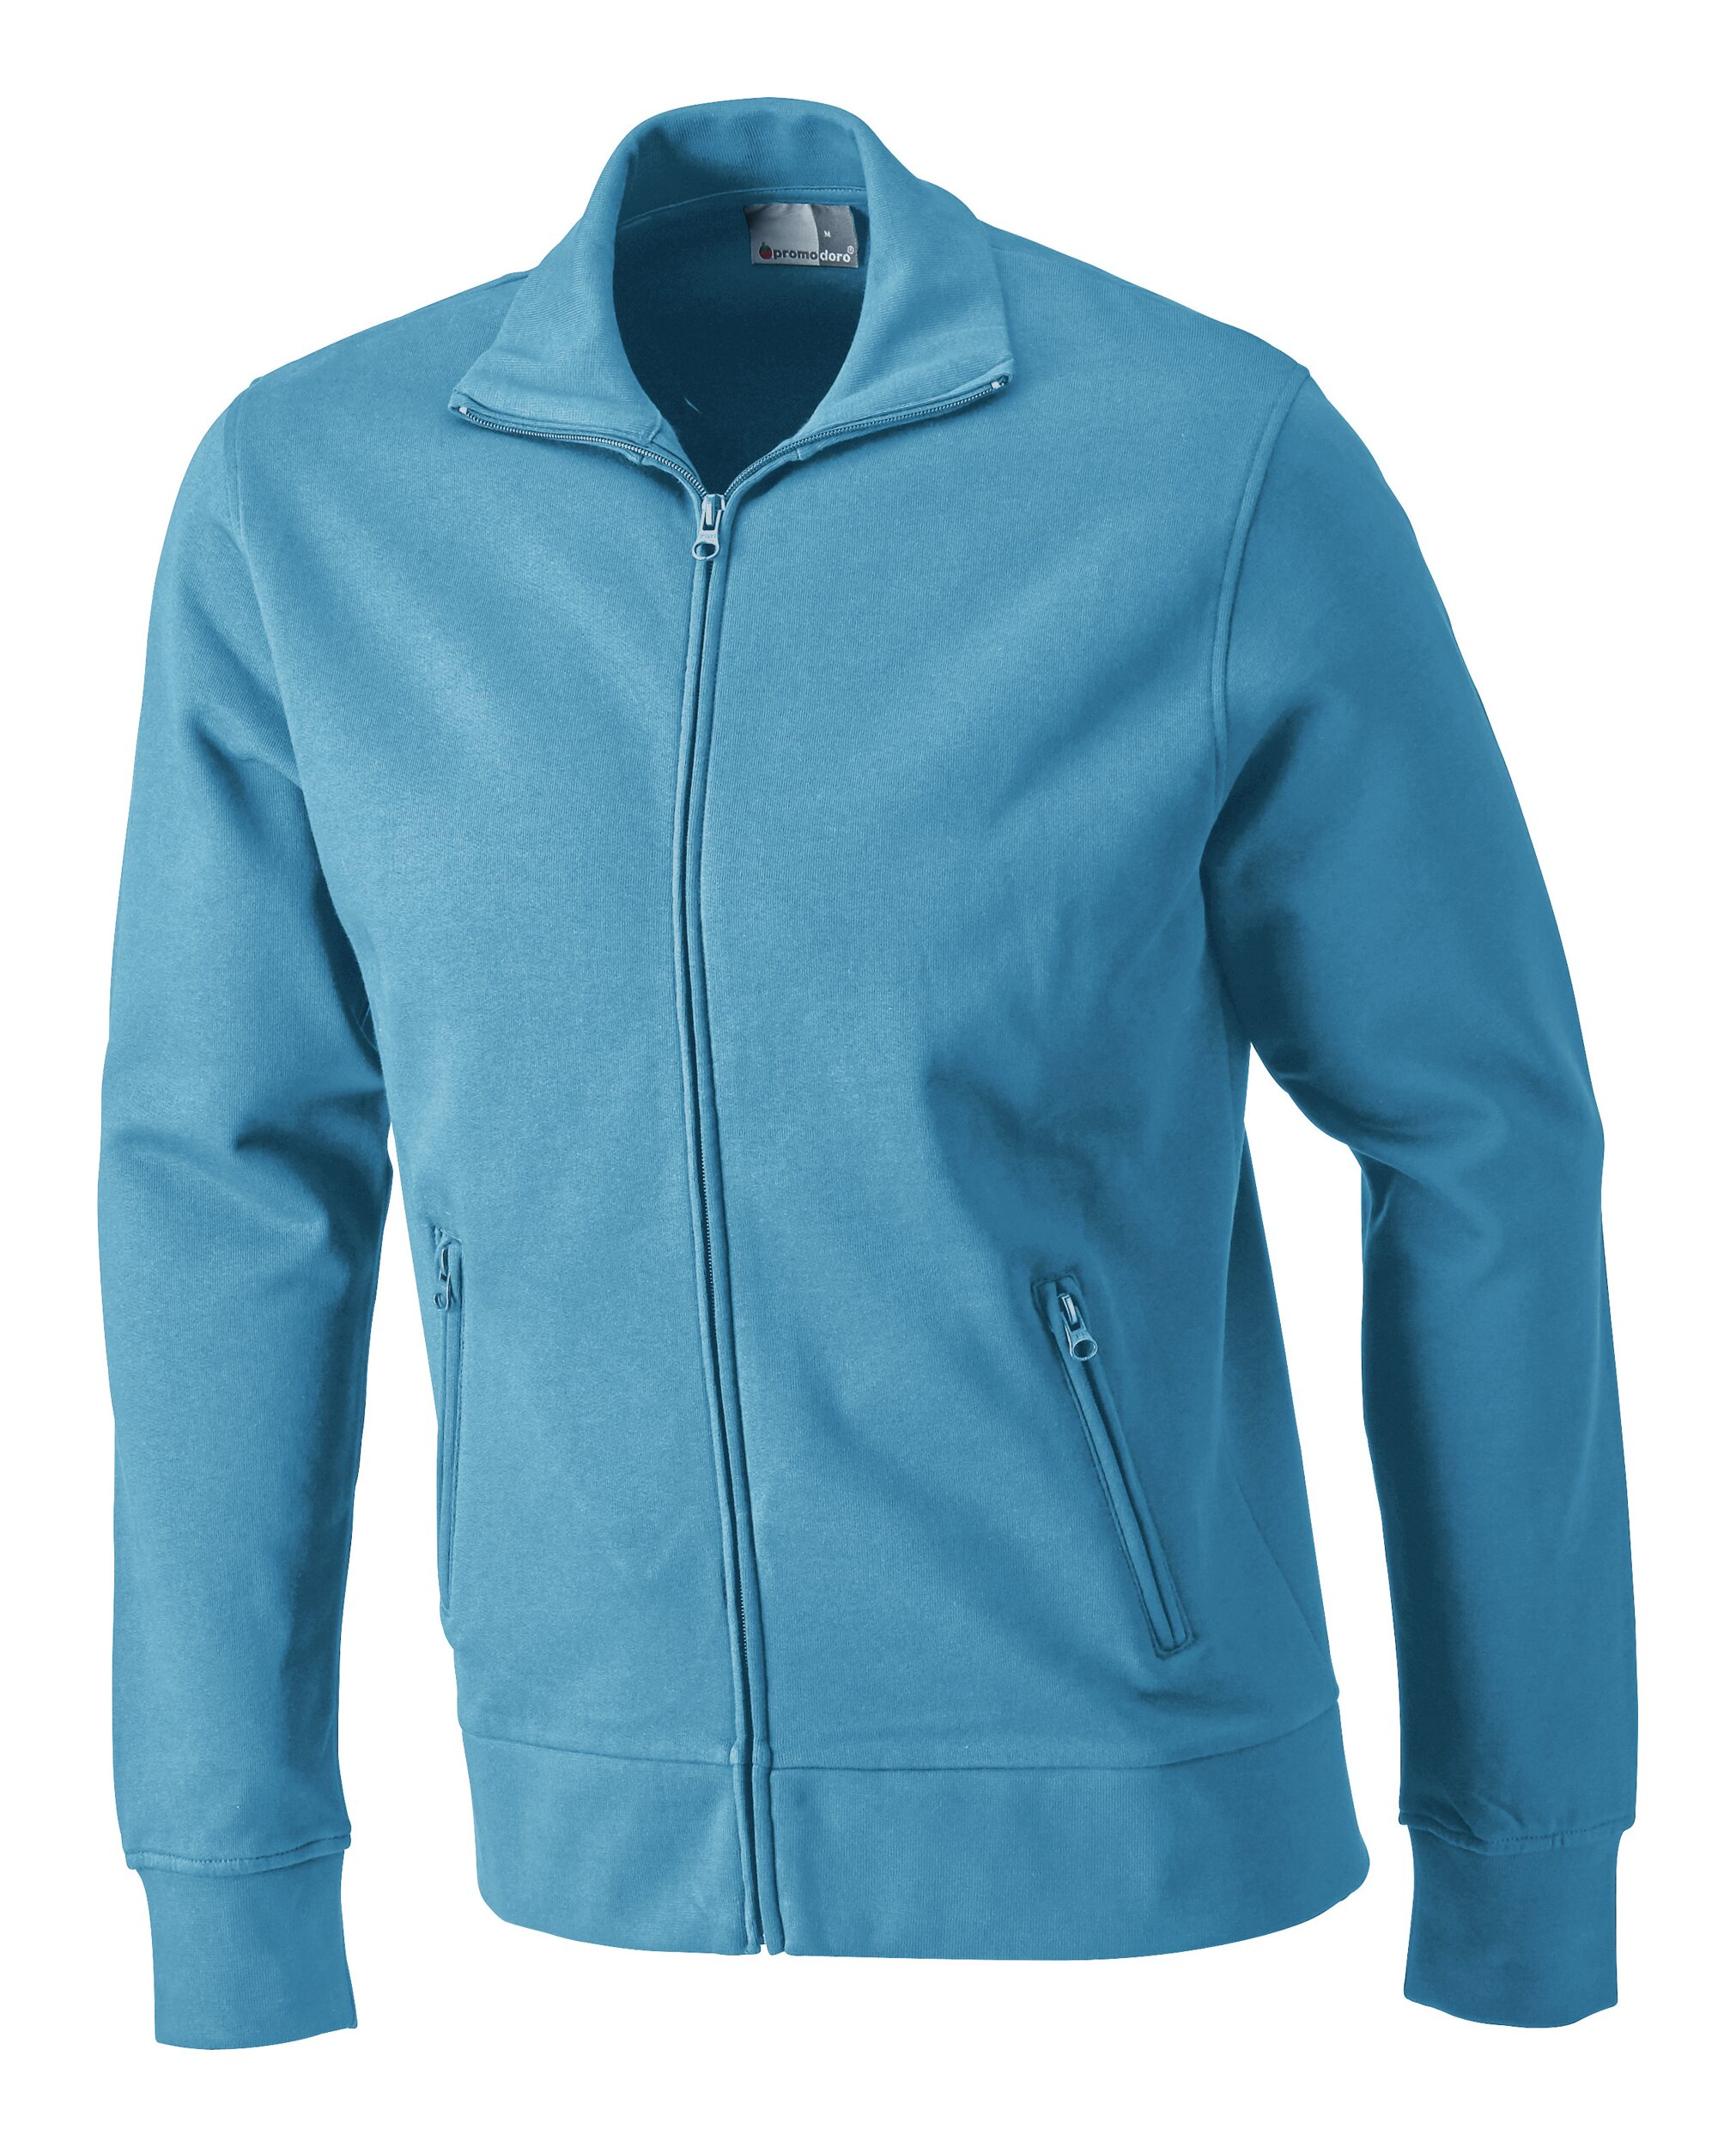 Sweatshirtjacke, Größe 3XL turquoise - 5290F-46-3XL